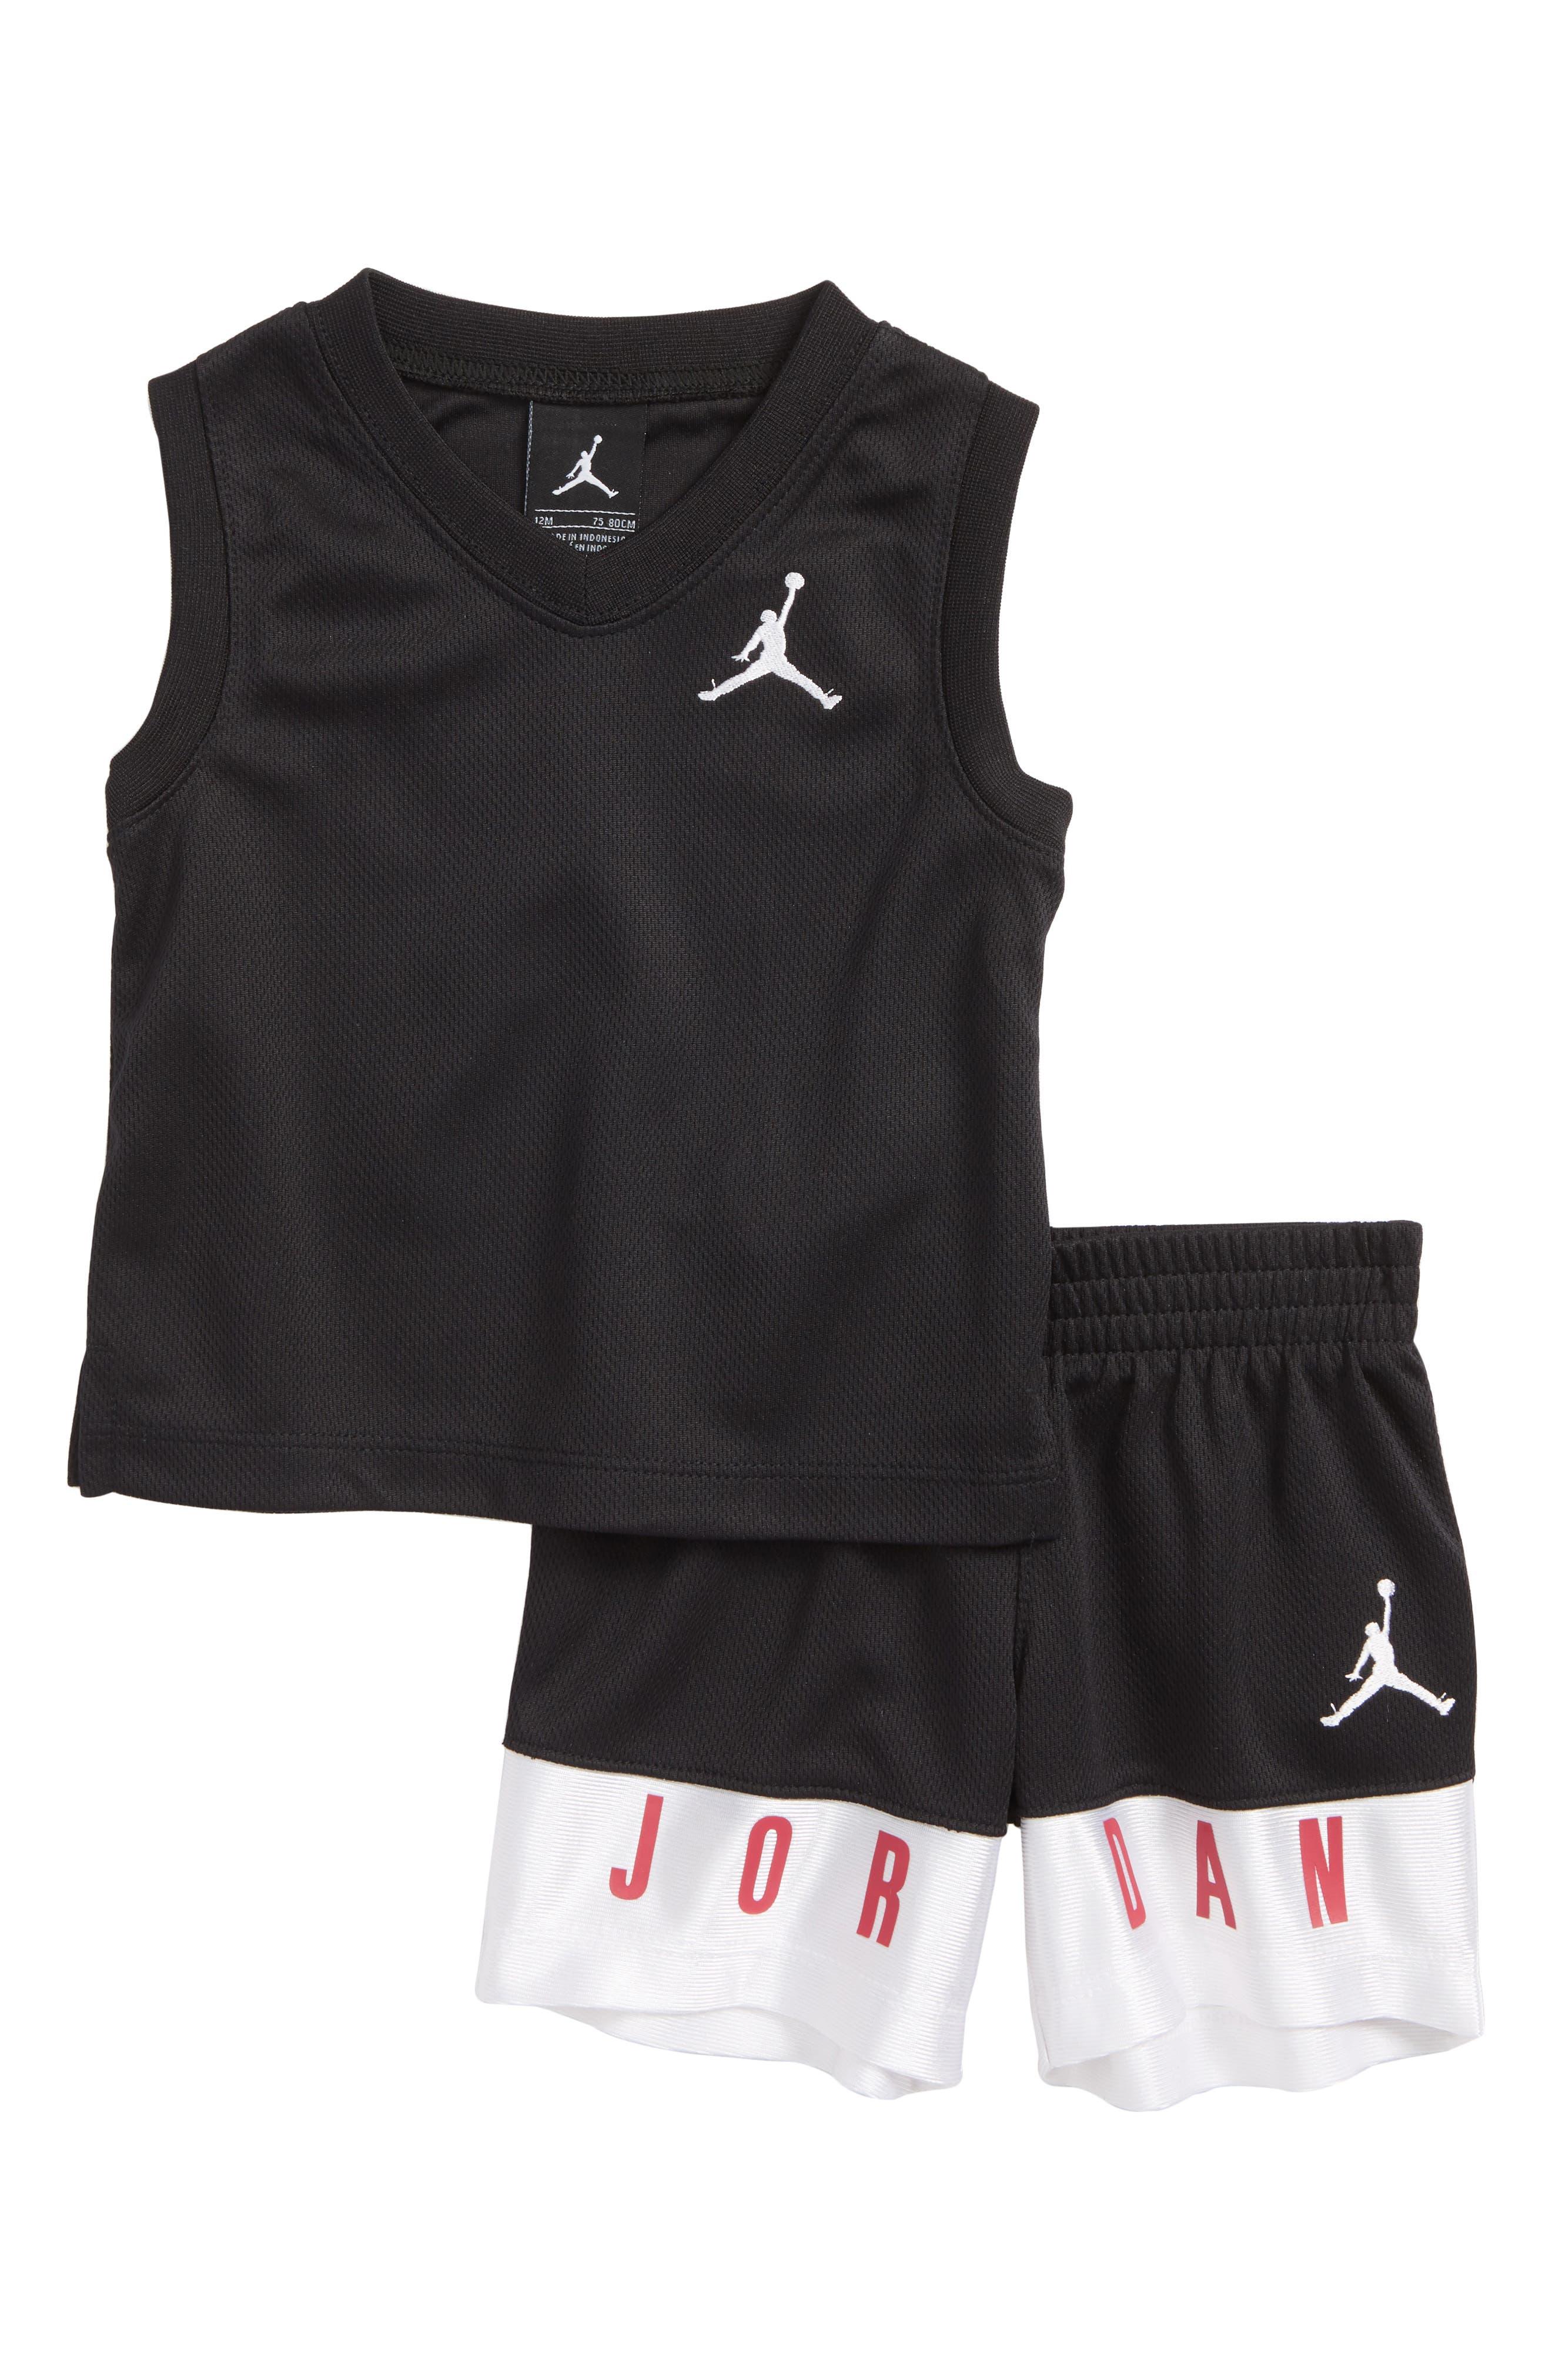 Jordan AJ23 Jersey Tank Top & Mesh Shorts Set (Baby)